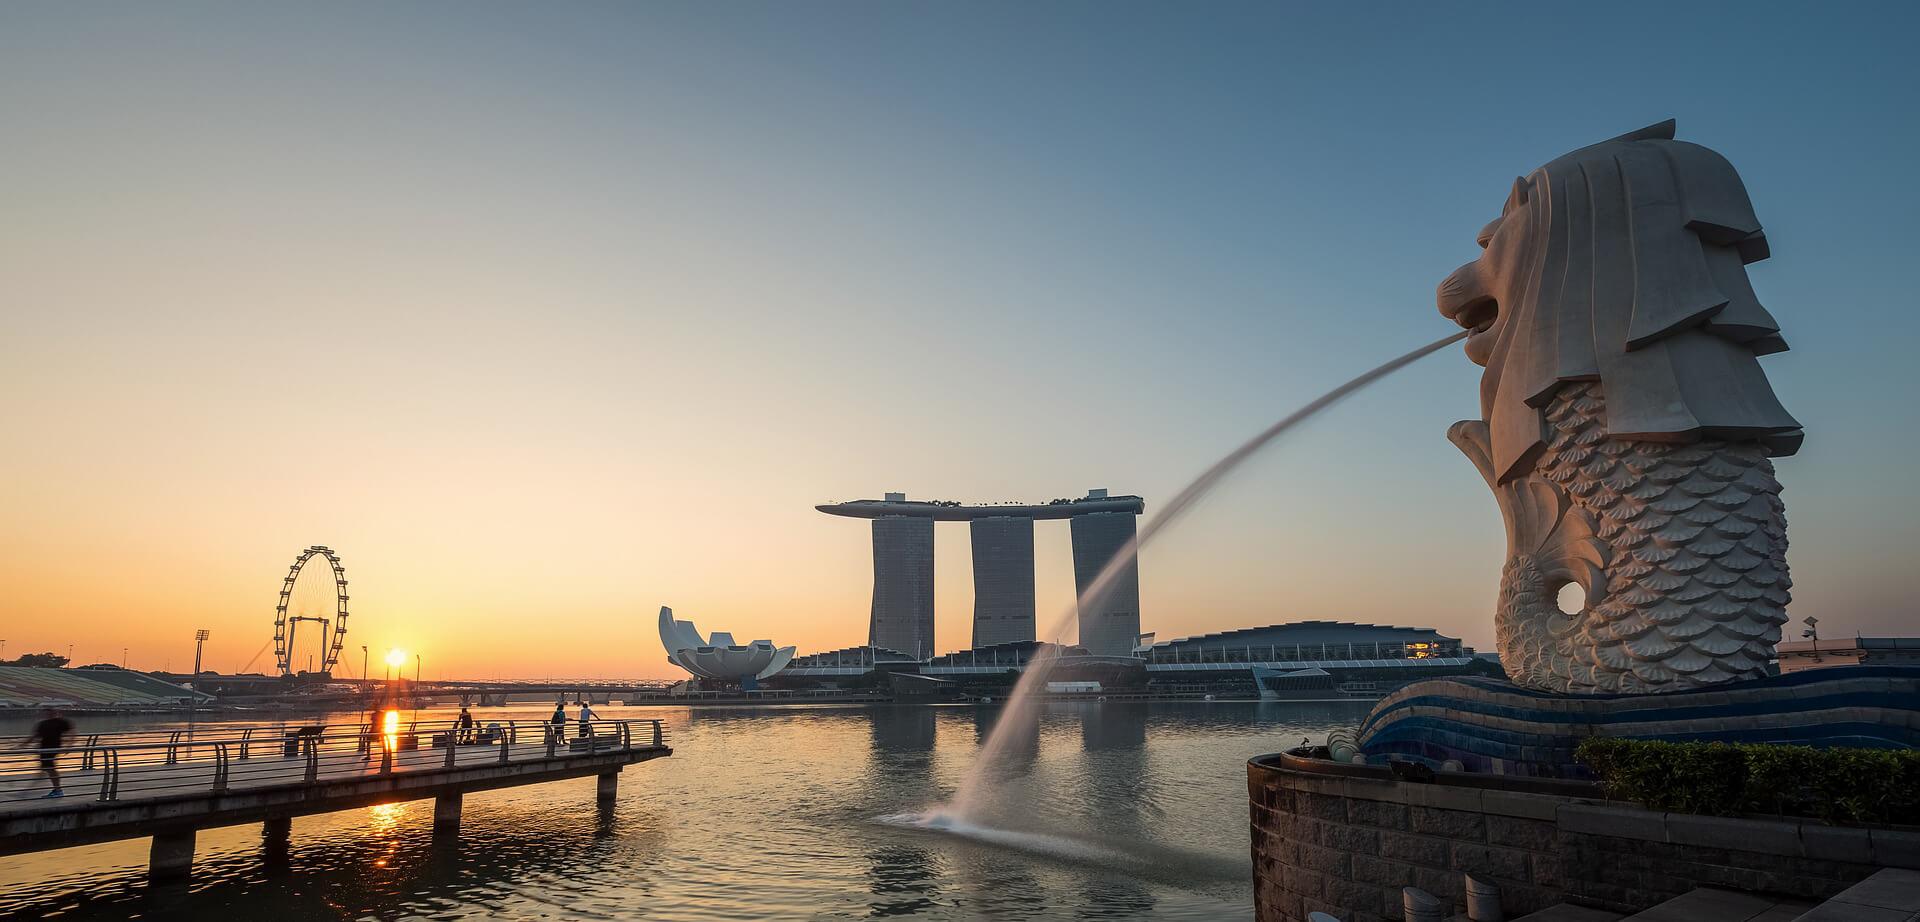 Singapore - Country